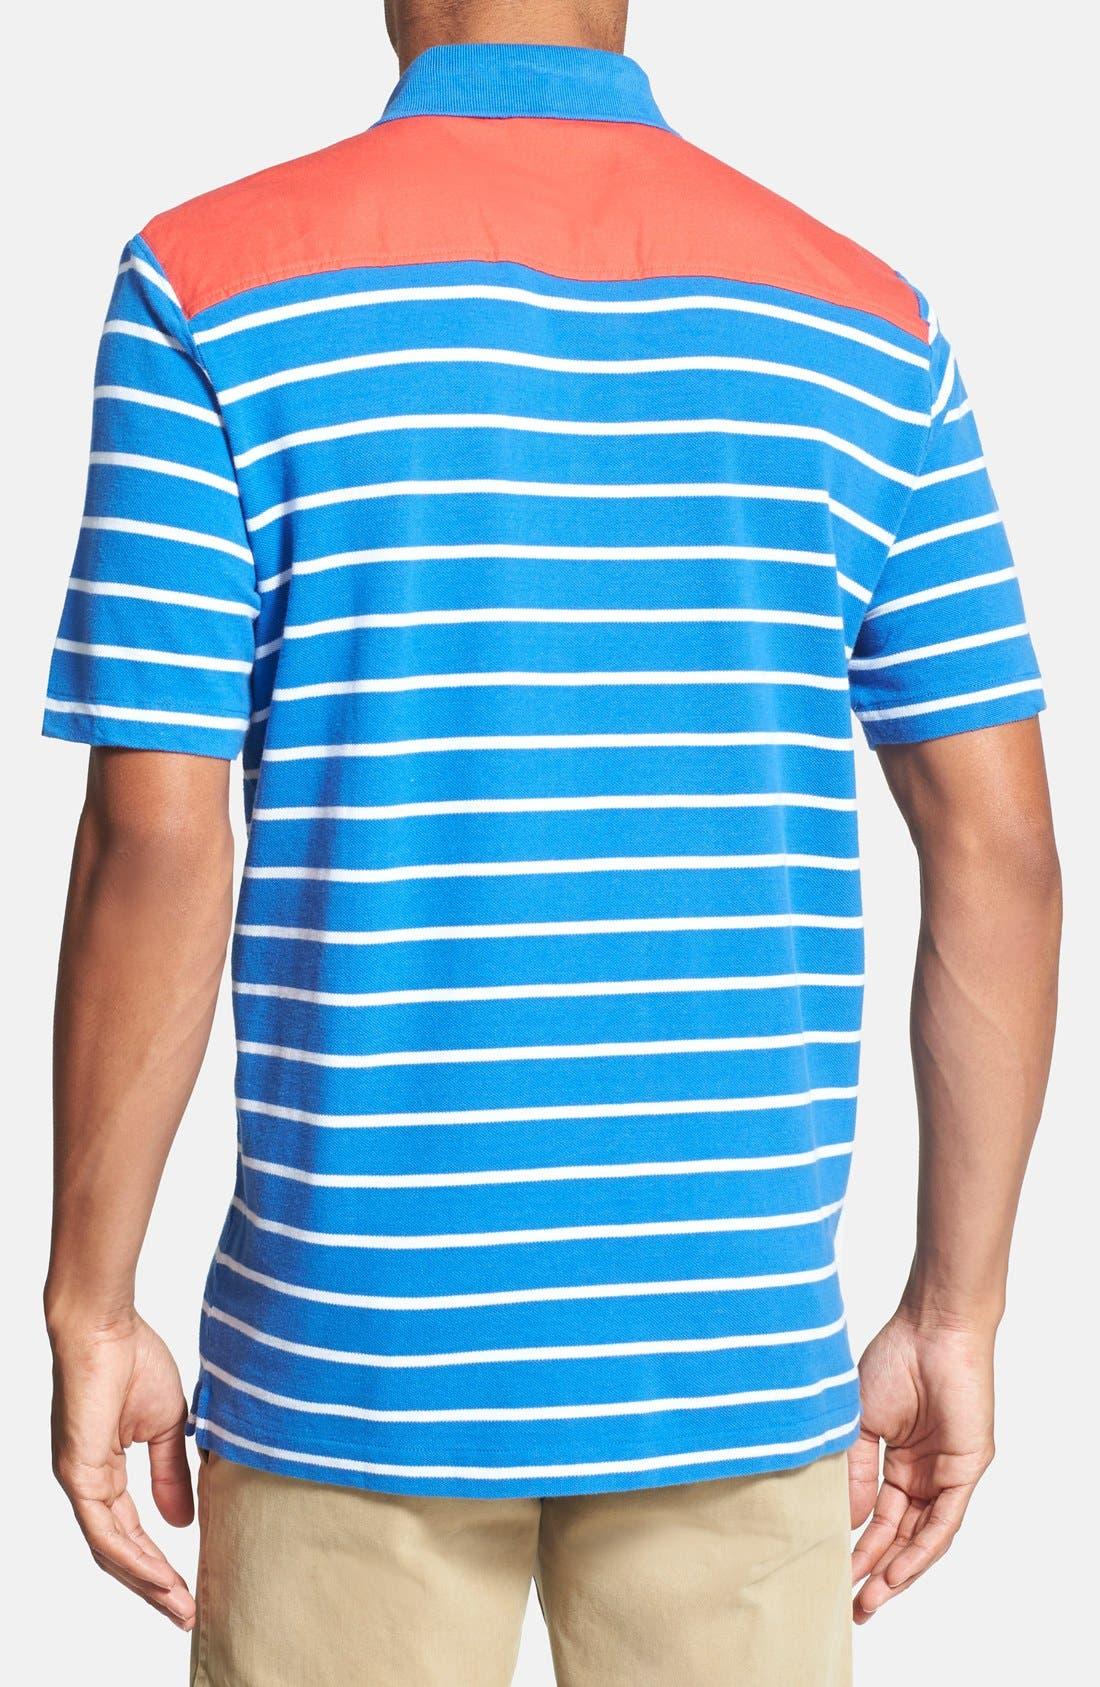 Alternate Image 2  - Vineyard Vines 'Shep' Stripe Polo Shirt